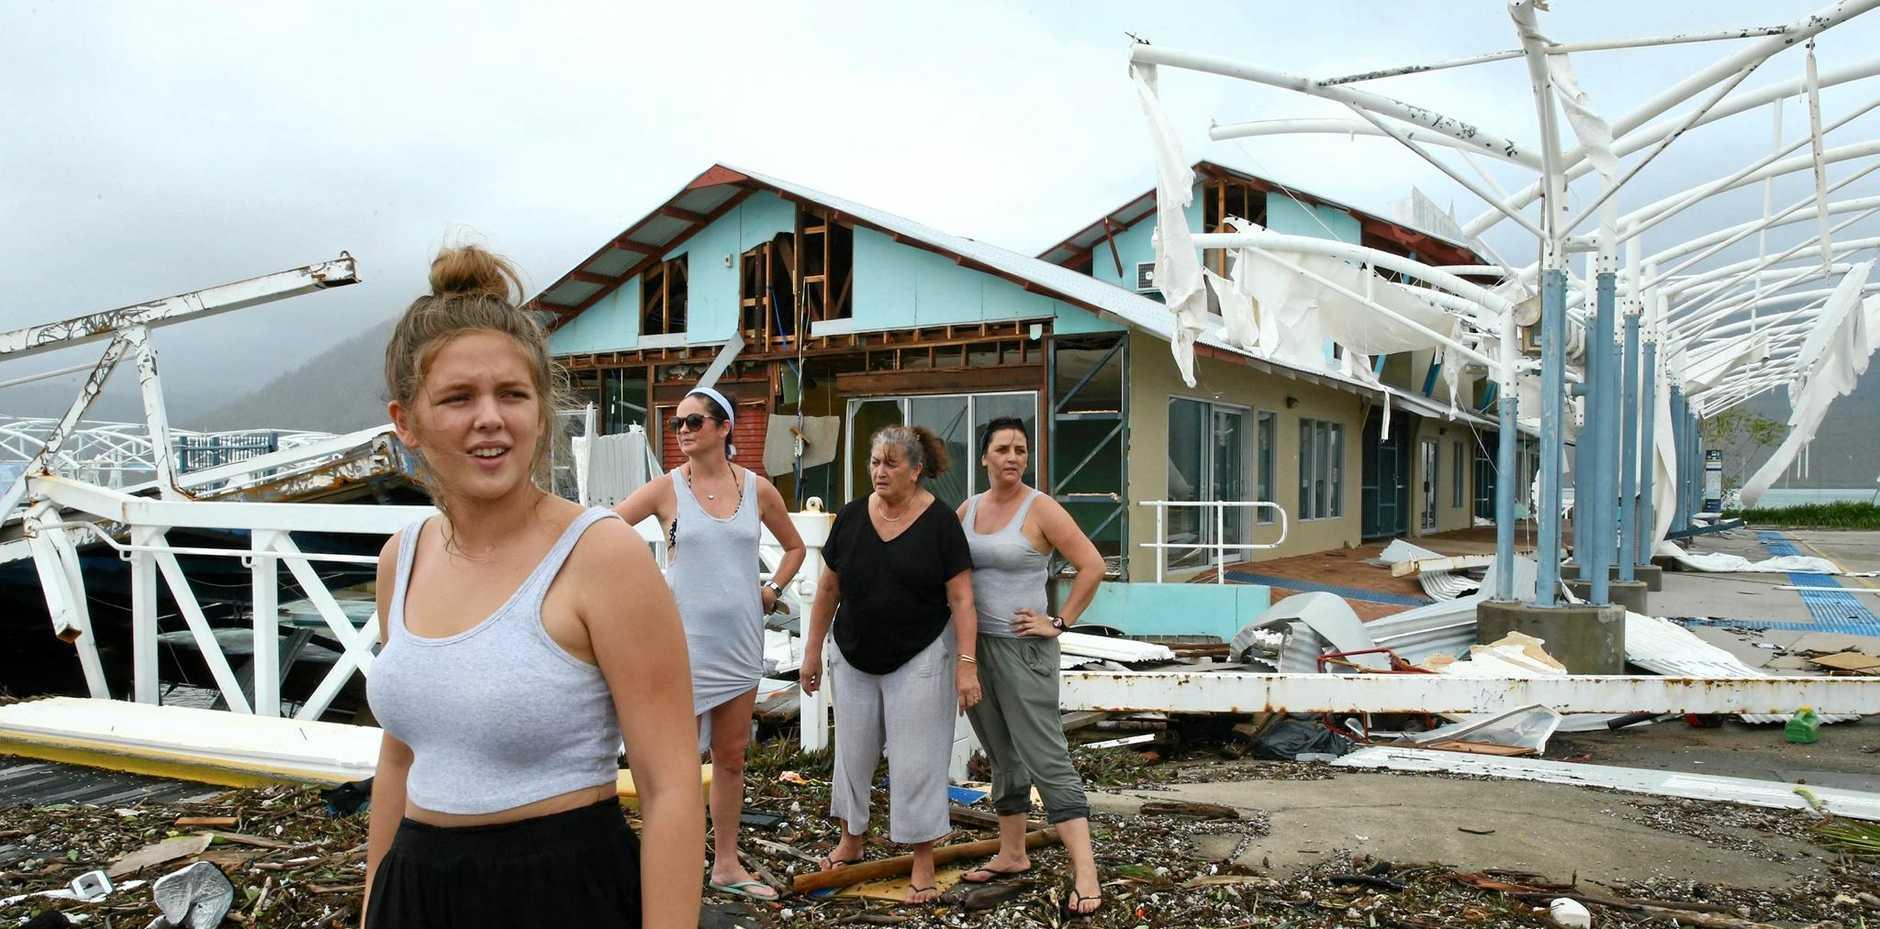 Airlie Beach residents Maika McDonald,15, Lauren Squires, Karen Gordon and Katelin Gordon survey the damage at Shute Harbour after Cyclone Debbie.